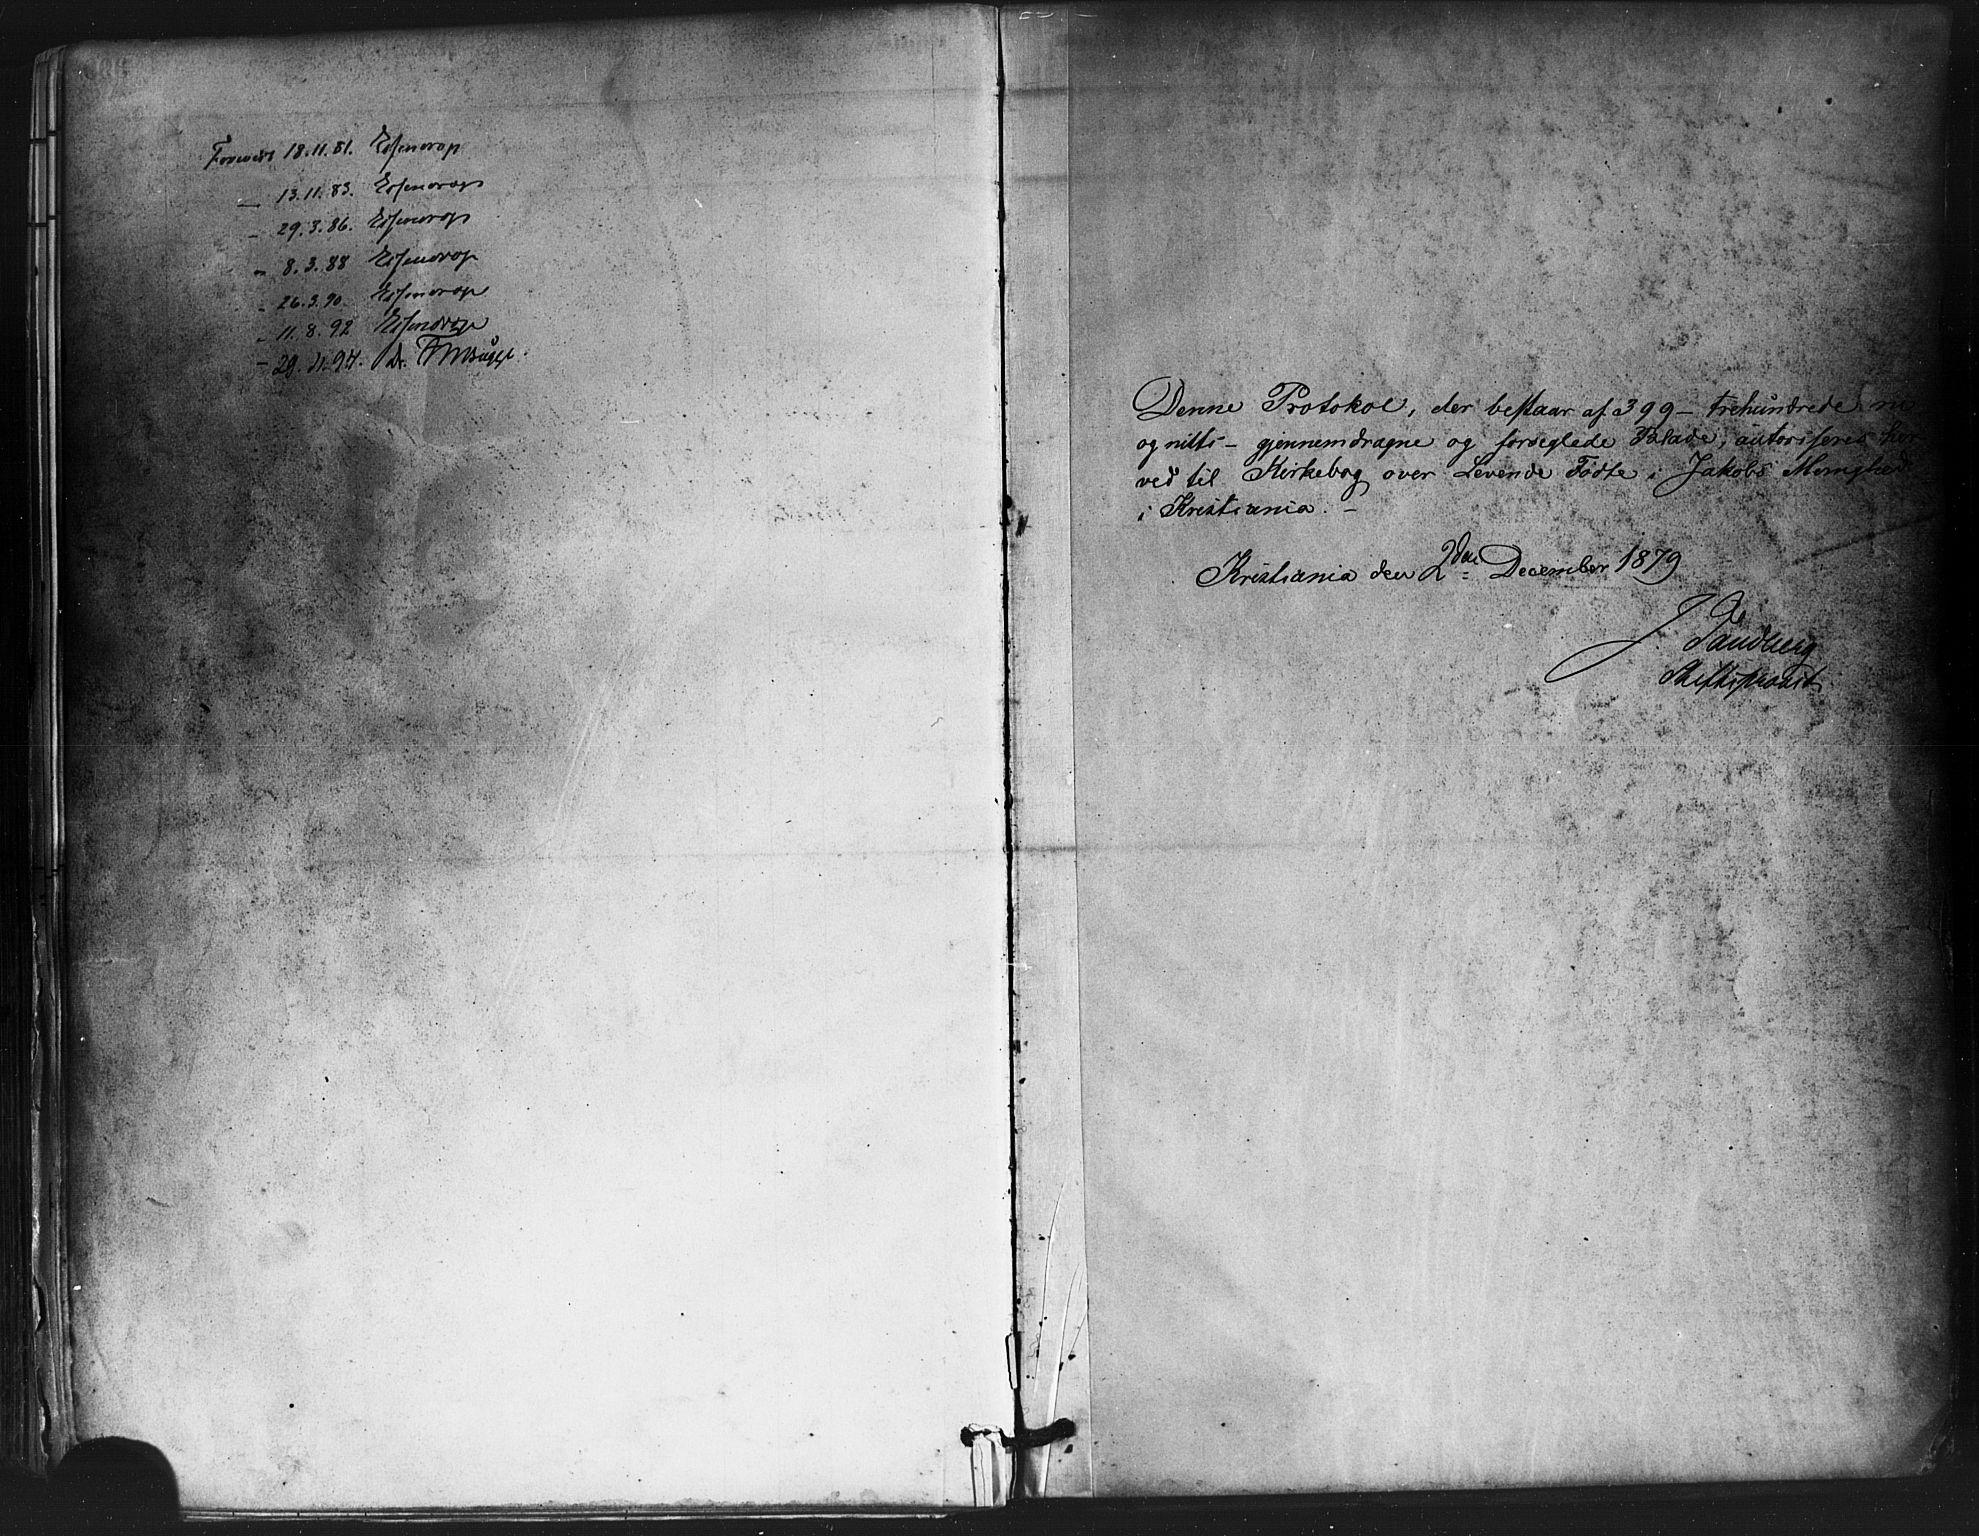 SAO, Jakob prestekontor Kirkebøker, F/Fa/L0003: Parish register (official) no. 3, 1880-1895